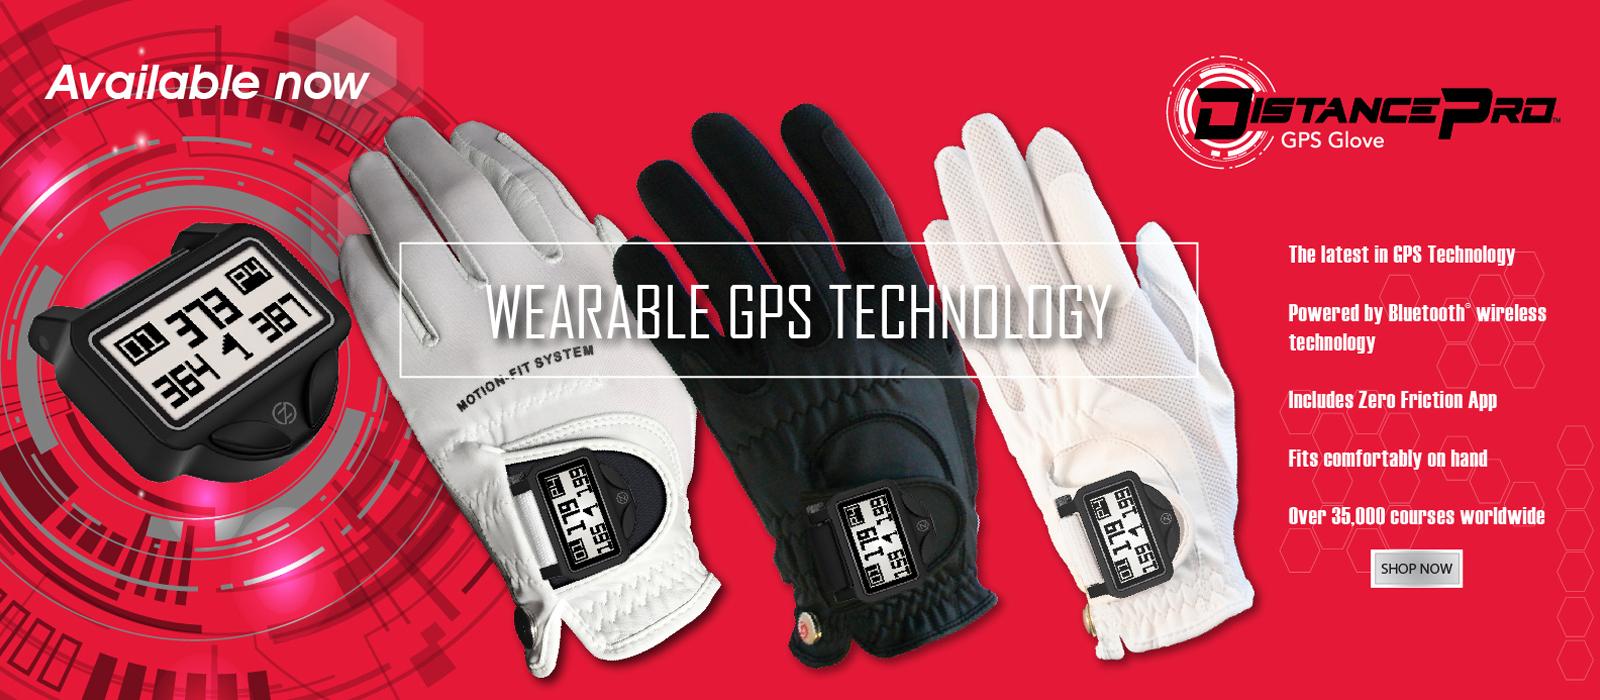 Distance Pro GPS Glove